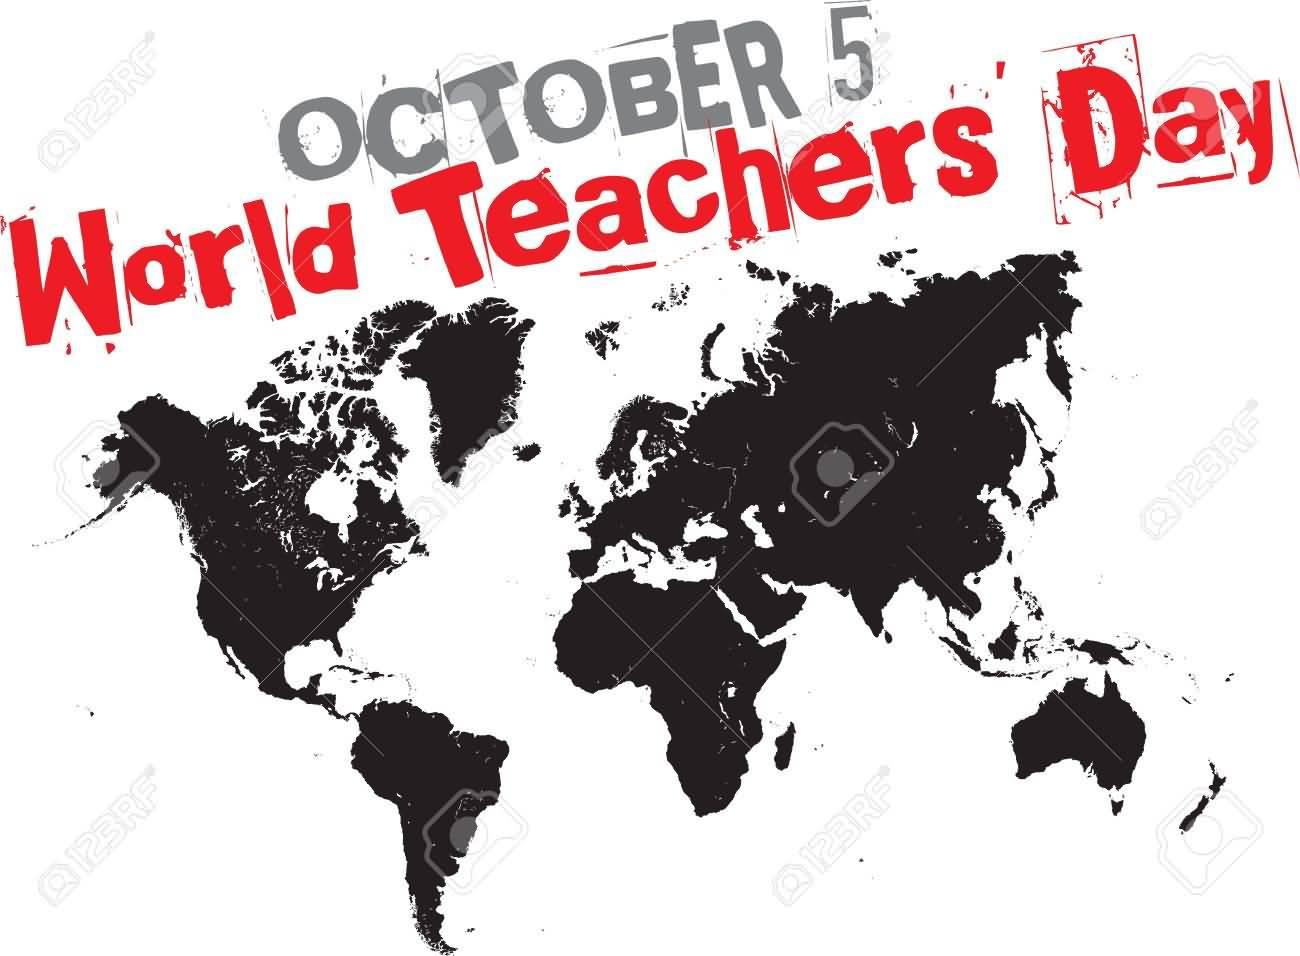 October 5 - Teachers Day, a worldwide holiday